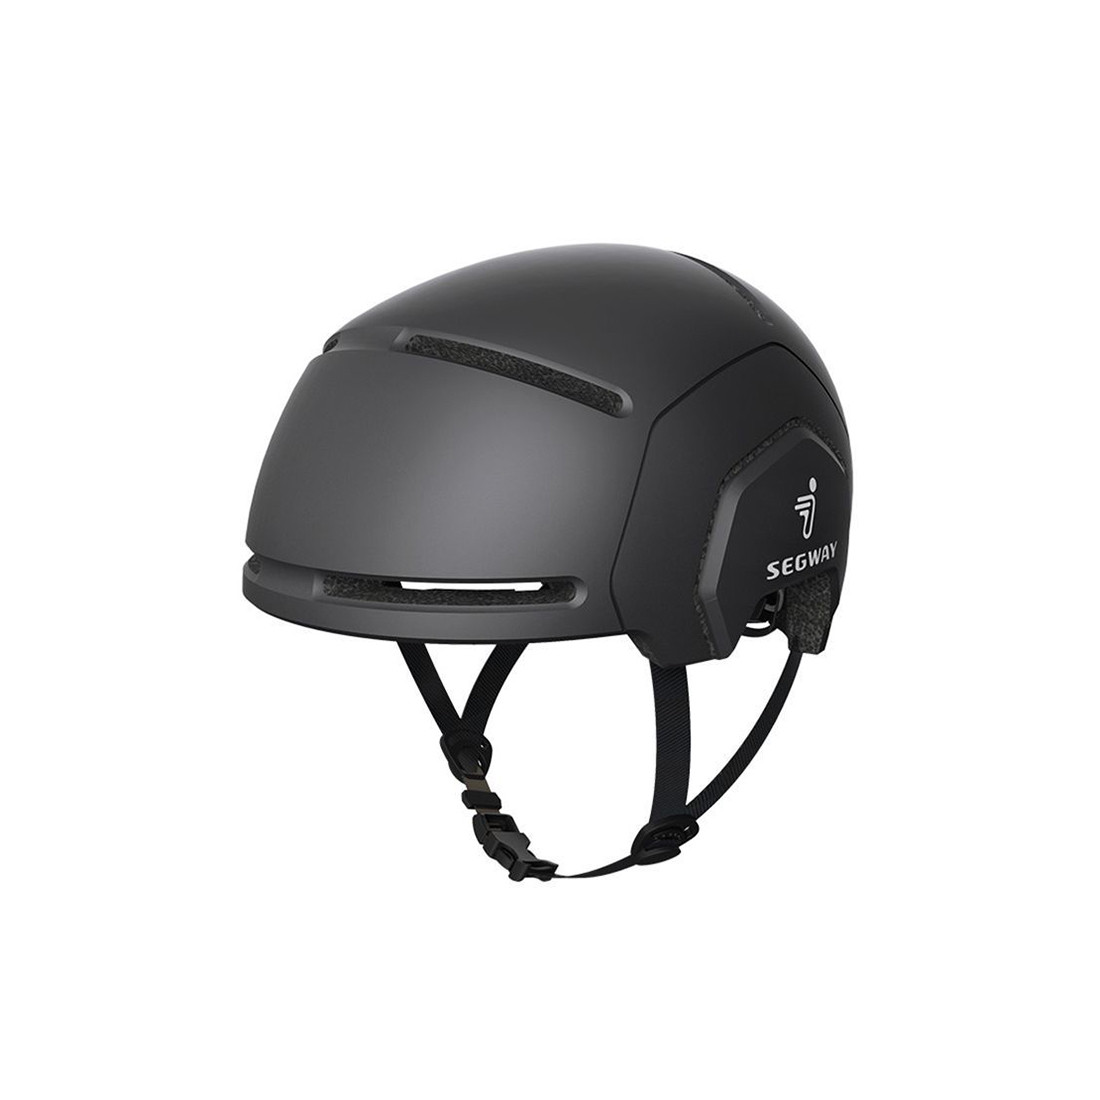 Защитный шлем  Segway Helmet PJ10ZMTK  Чёрный (S/M)